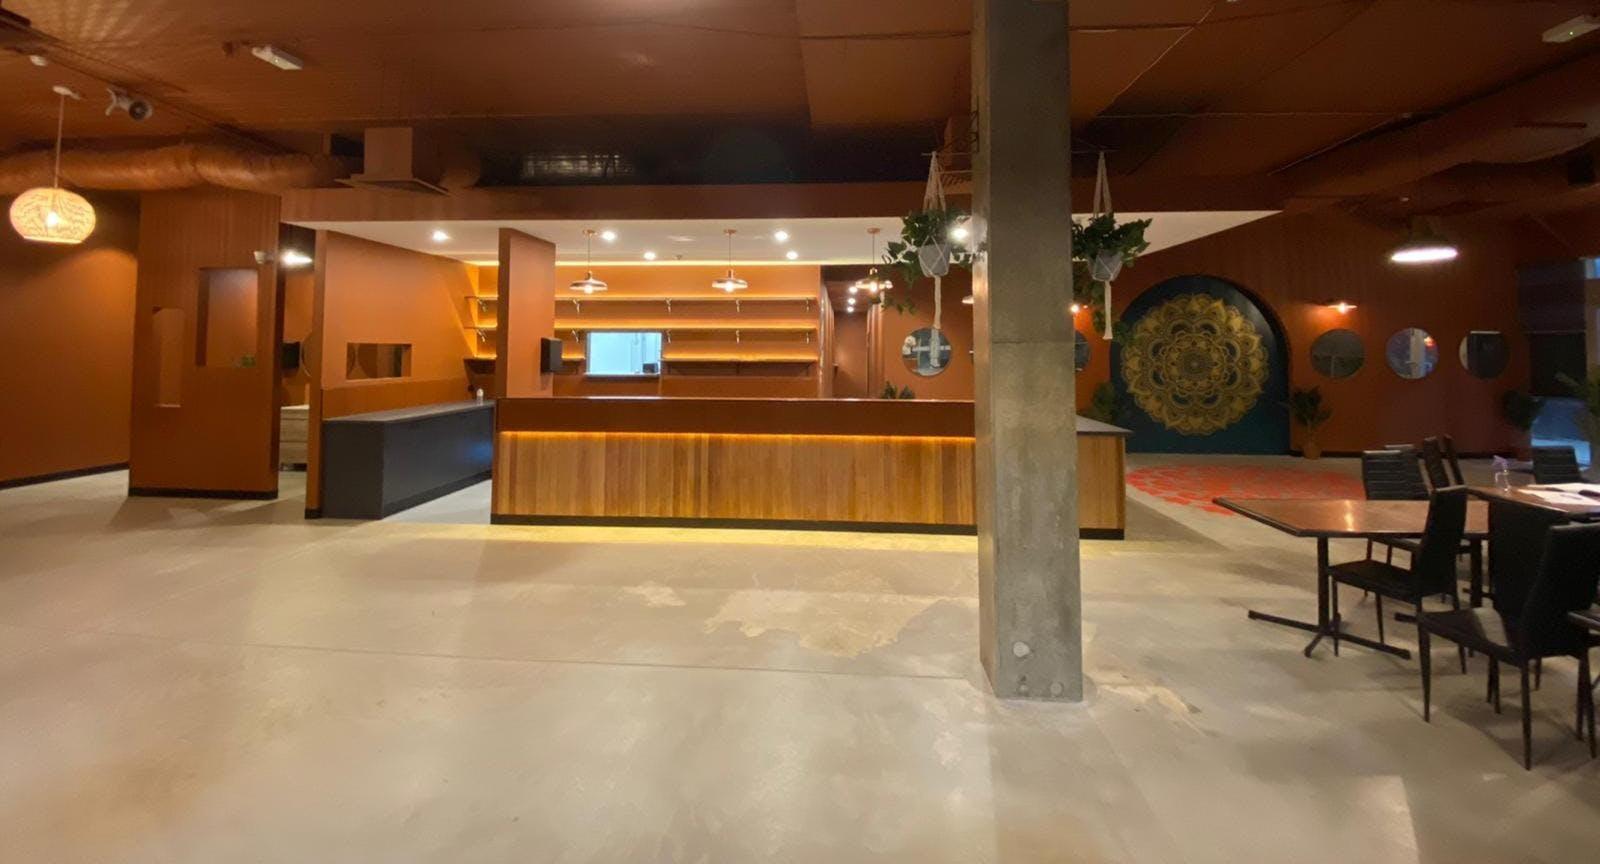 Photo of restaurant Dosa Hut - Craigieburn in Craigieburn, Melbourne